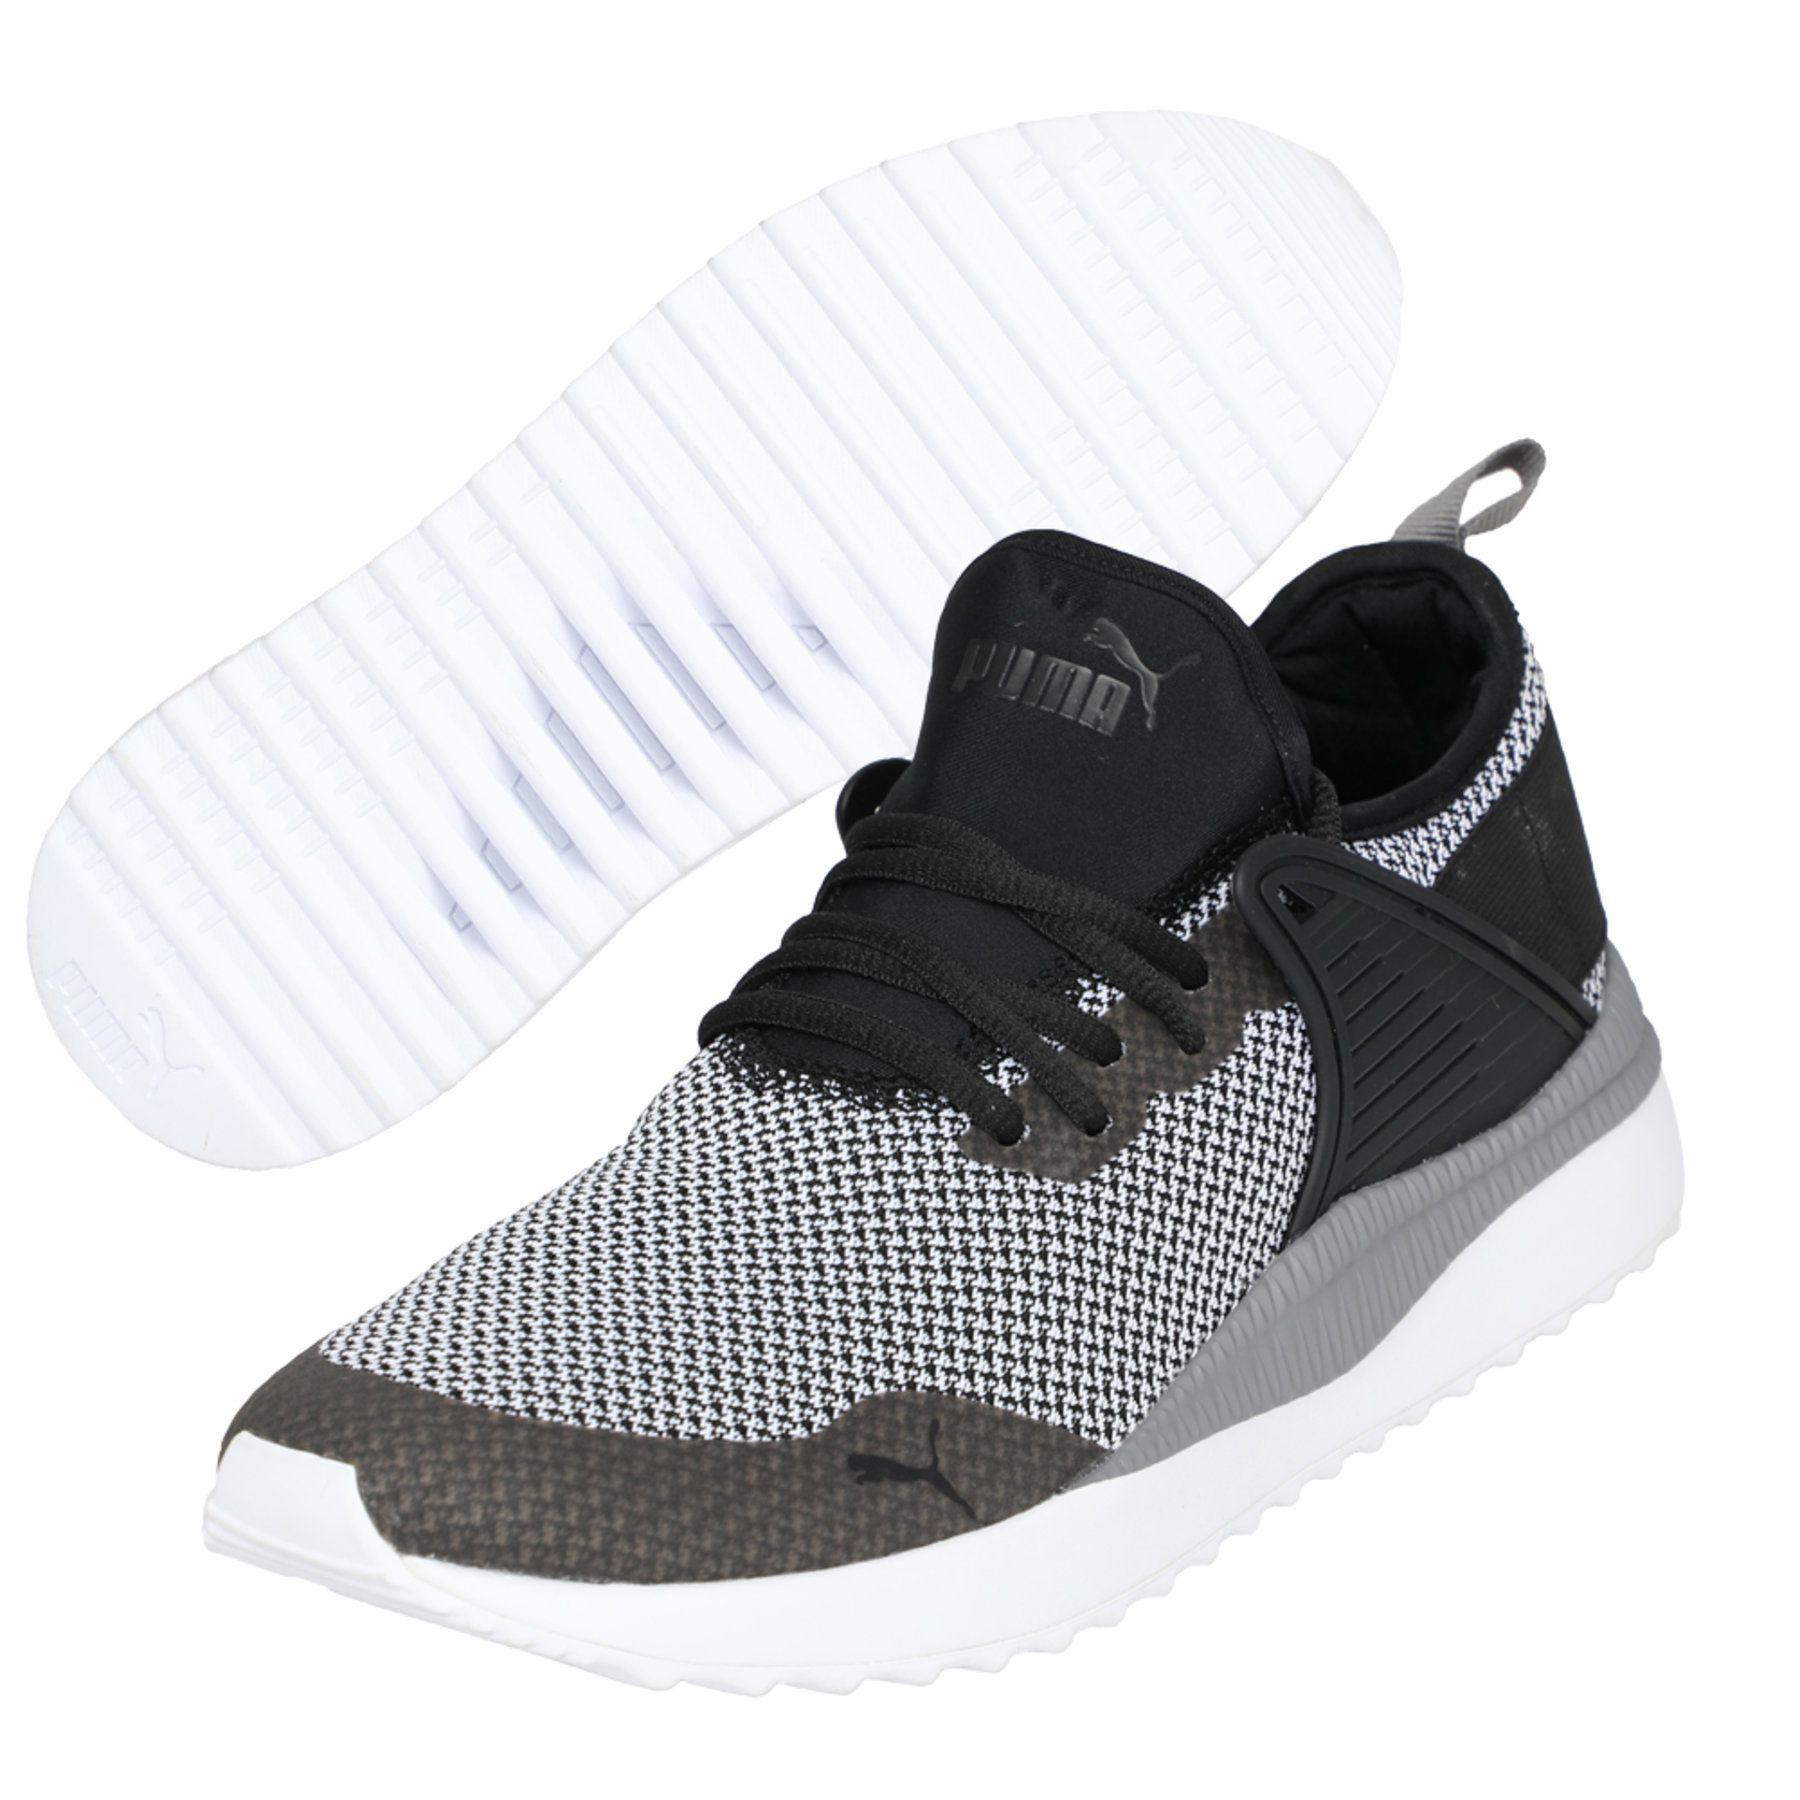 cf7654e1d0f26c Puma Pacer Next Cage Gk Black Running Shoes - Buy Puma Pacer Next ...